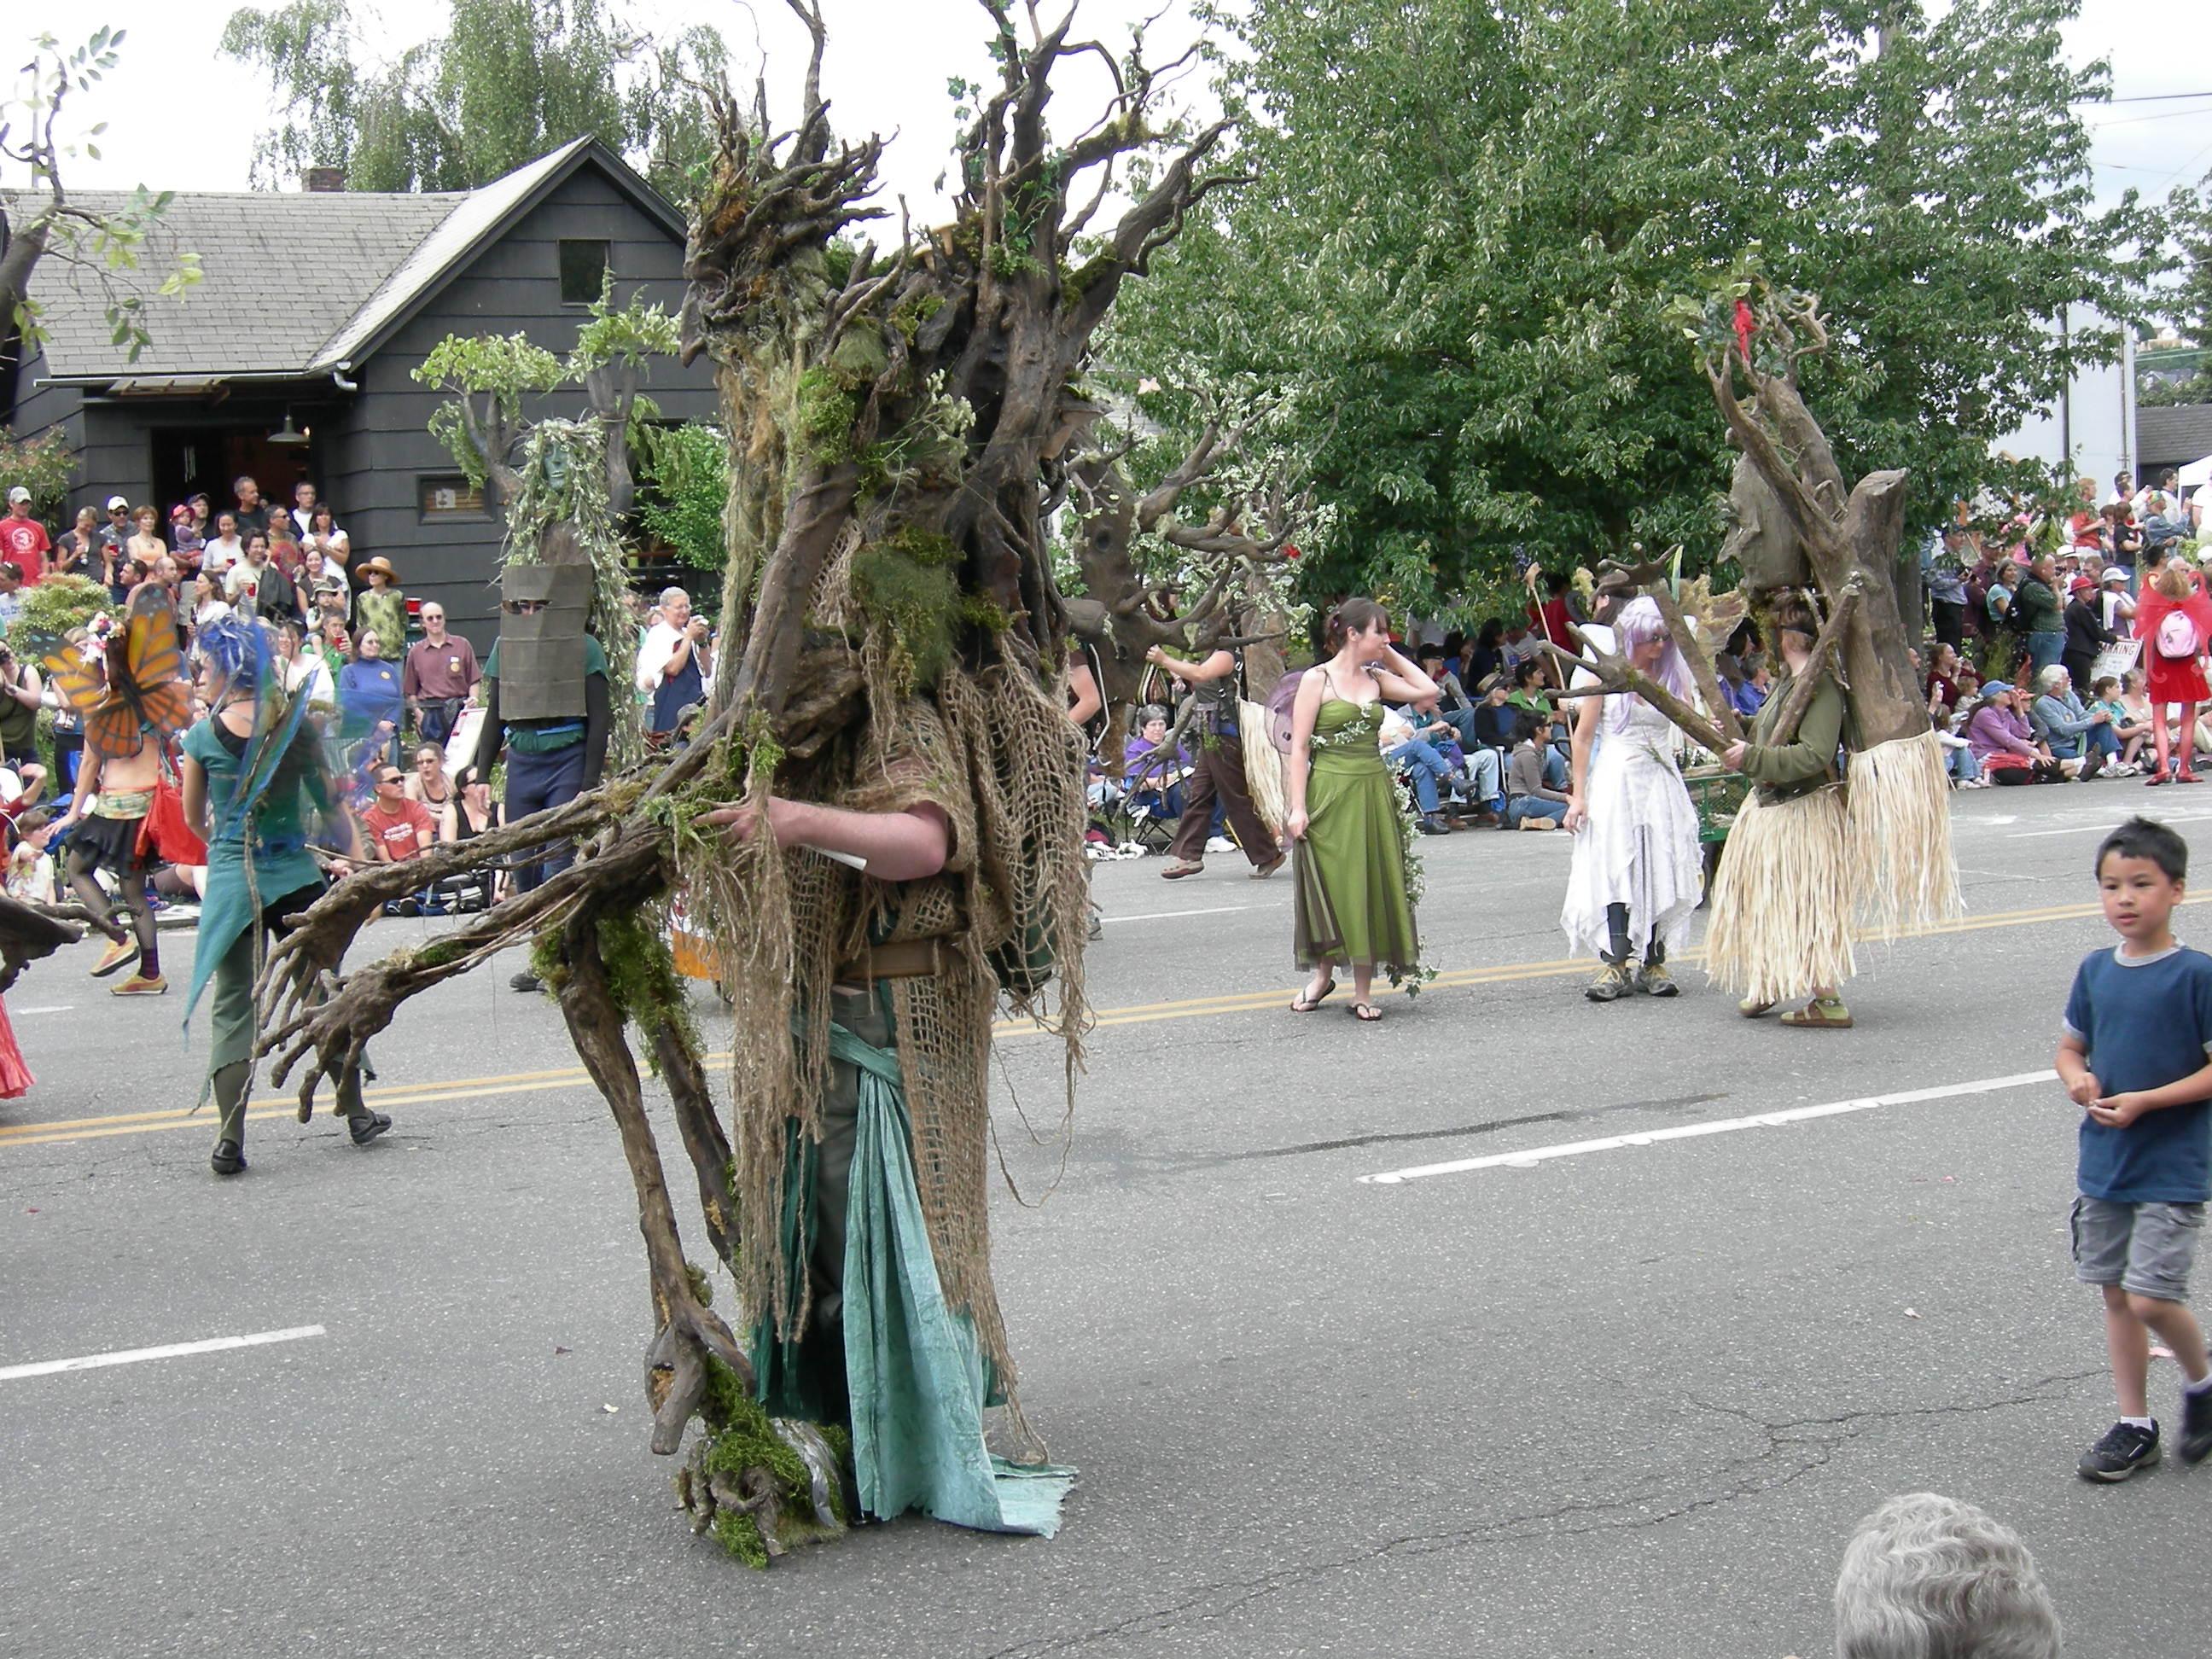 The Parade Ring Clane Menu